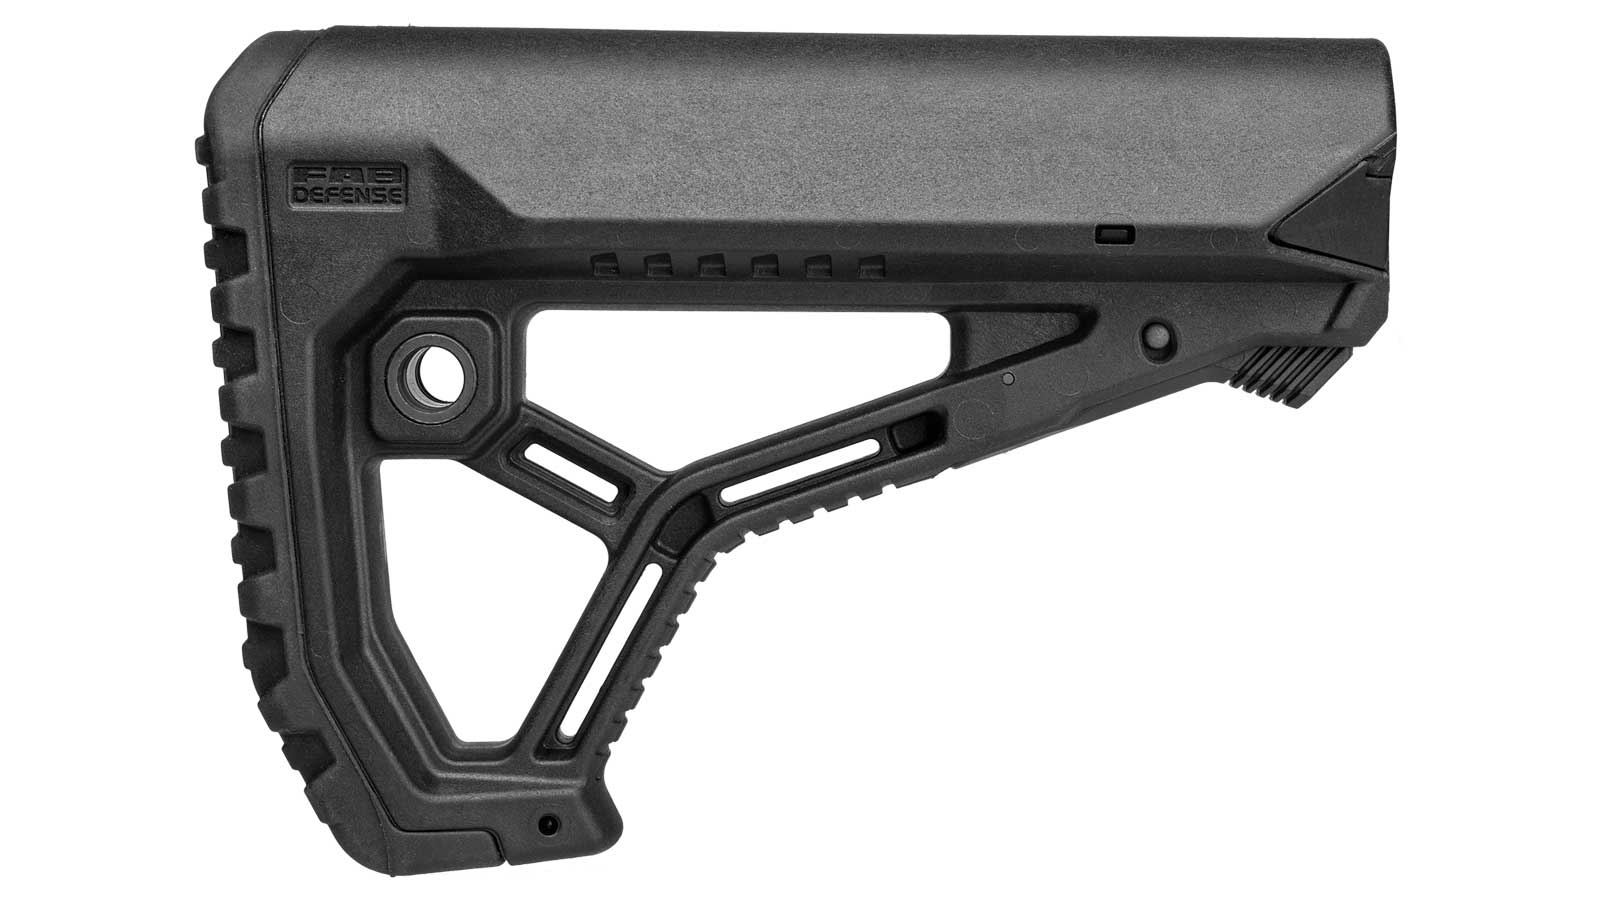 Mako Group Fab Defense AR15 Butt Stock Mil-Spec|Commercial Polymer Black